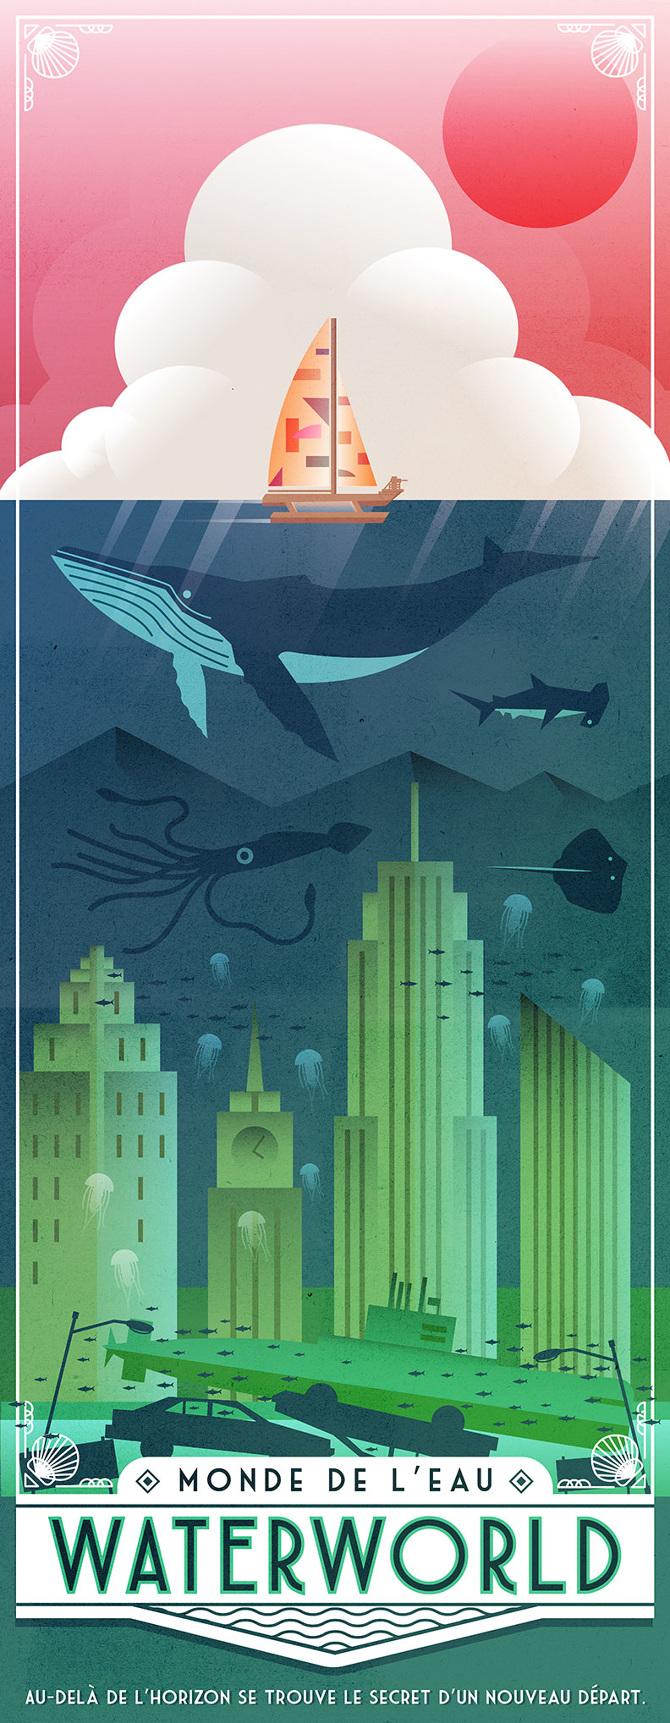 Waterworld Travel Poster